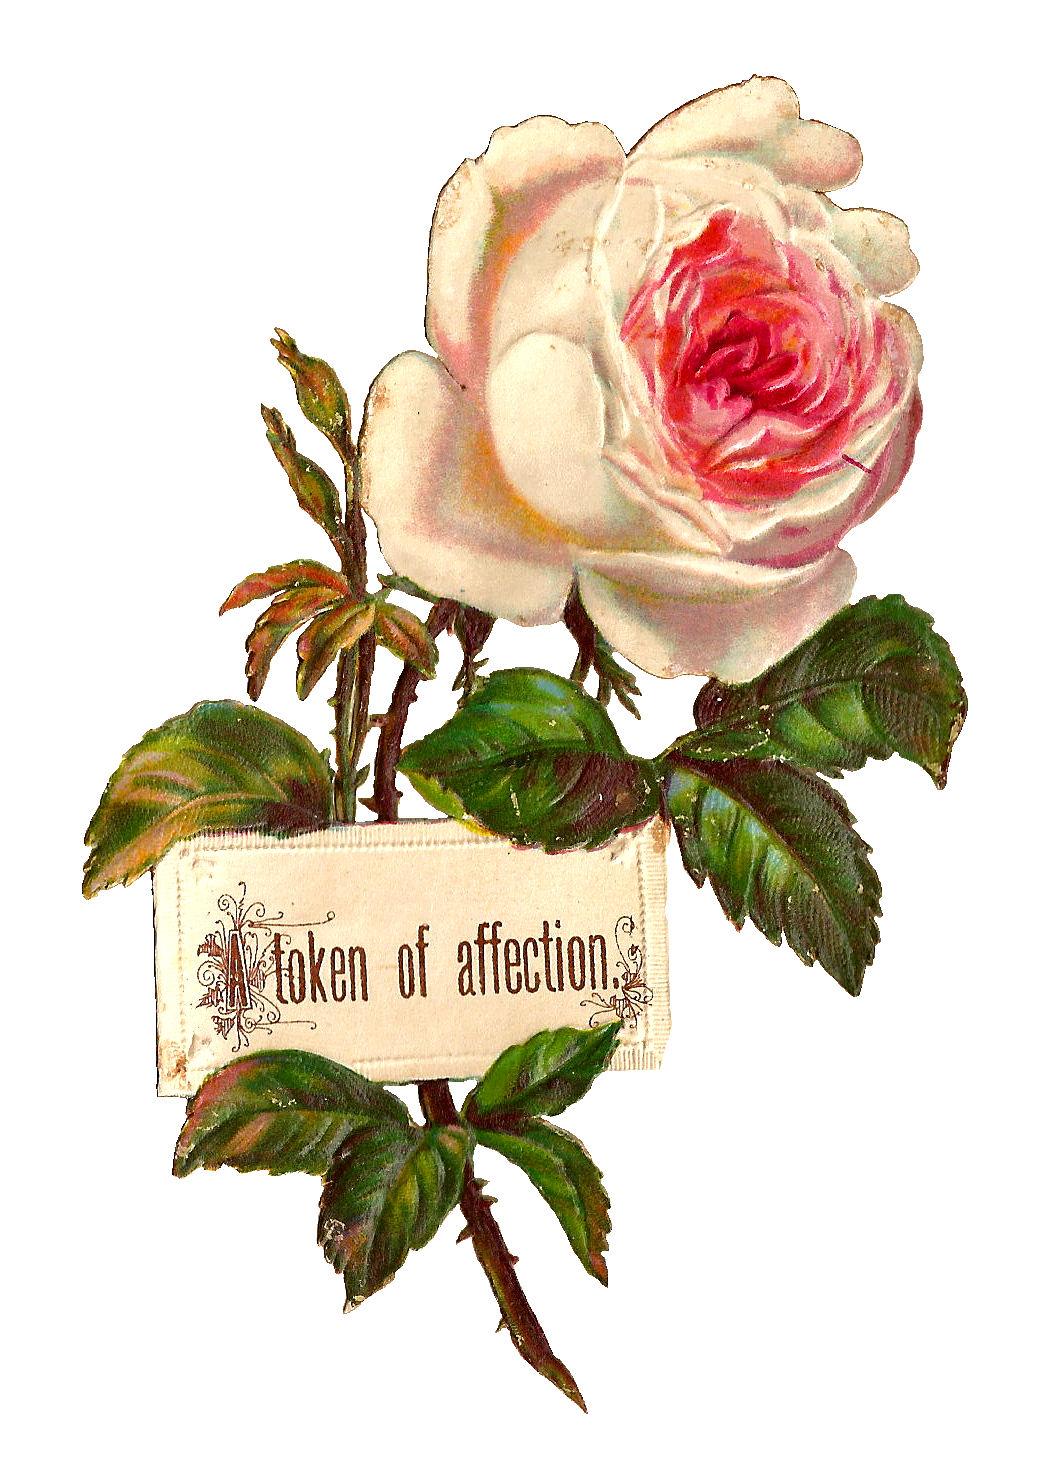 Antique Images Printable White Rose Label Design Blank